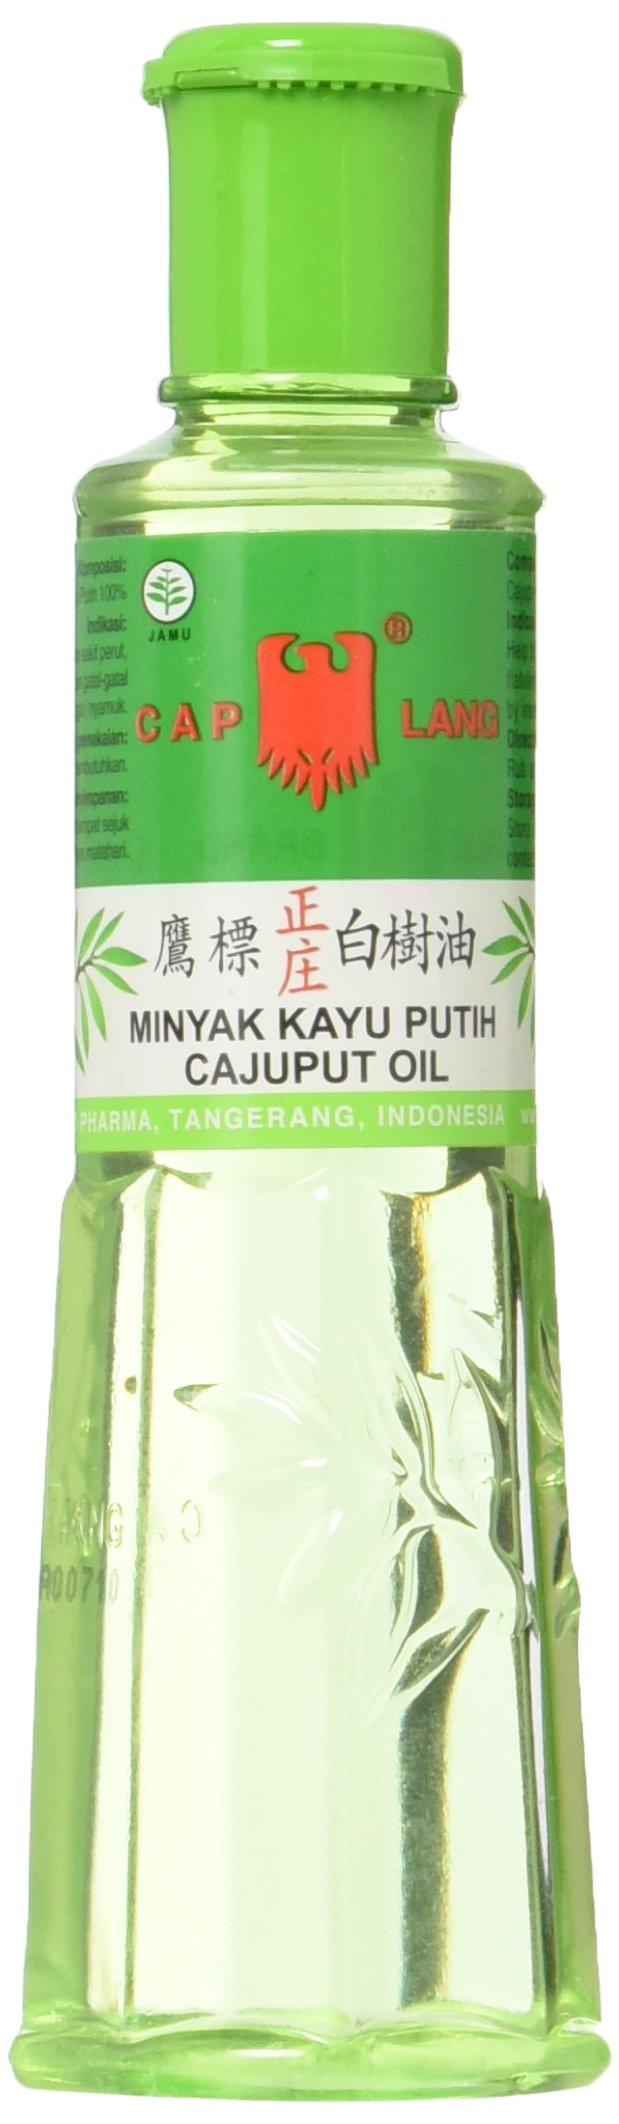 Sido Muncul Tolak Angin Herbal With Honey 12 Ct 180 Ml Isi Sachet Cajaput Oil Minyak Kayu Putih 120